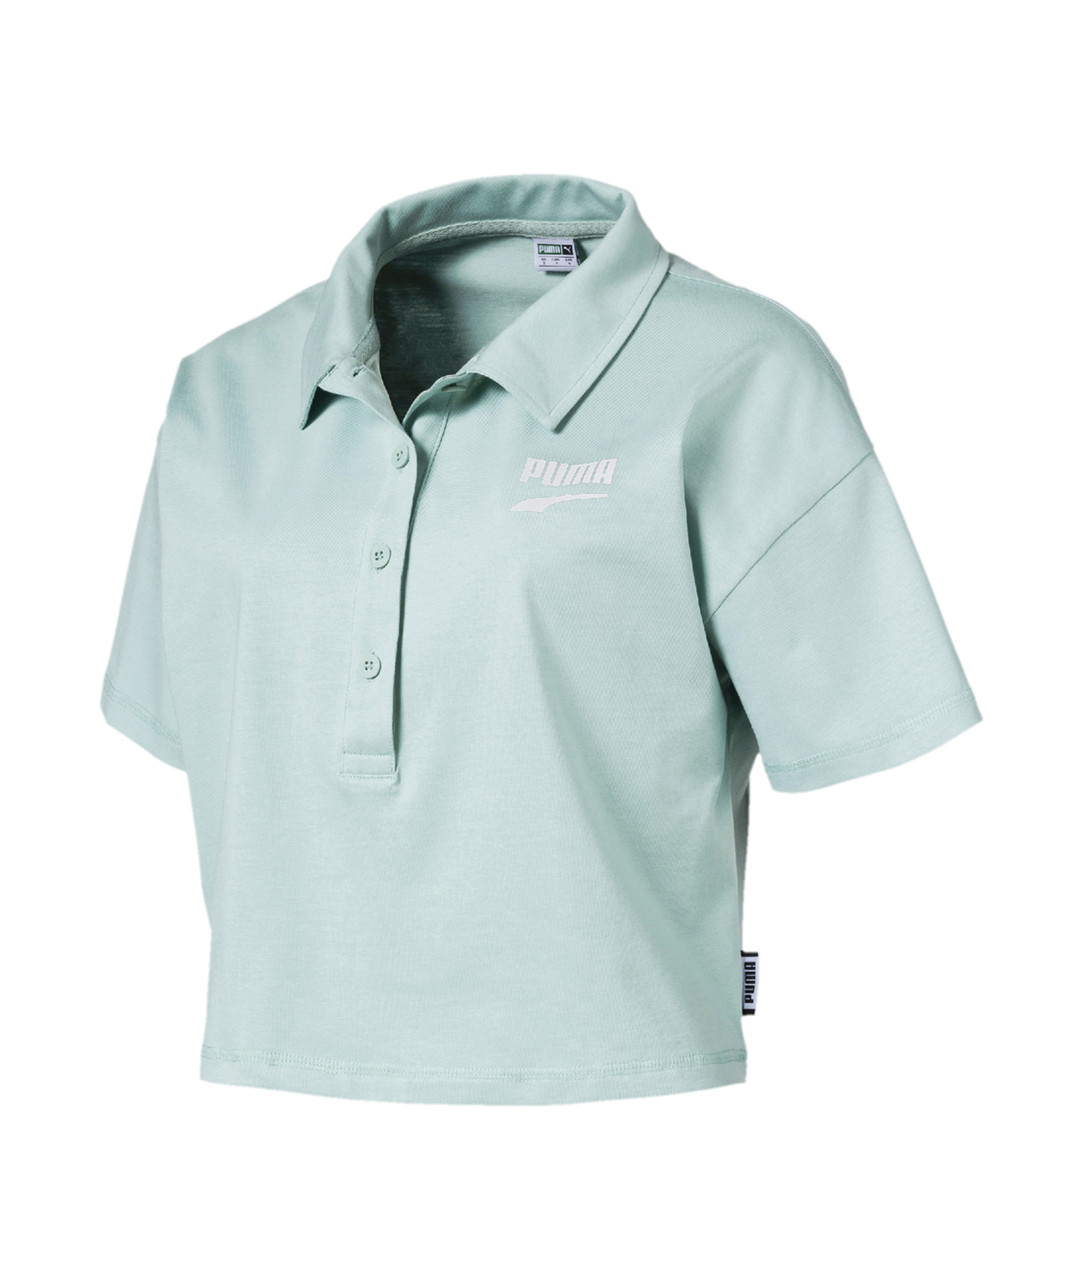 Женская спортивная футболка Downtown Women's Polo Shirt